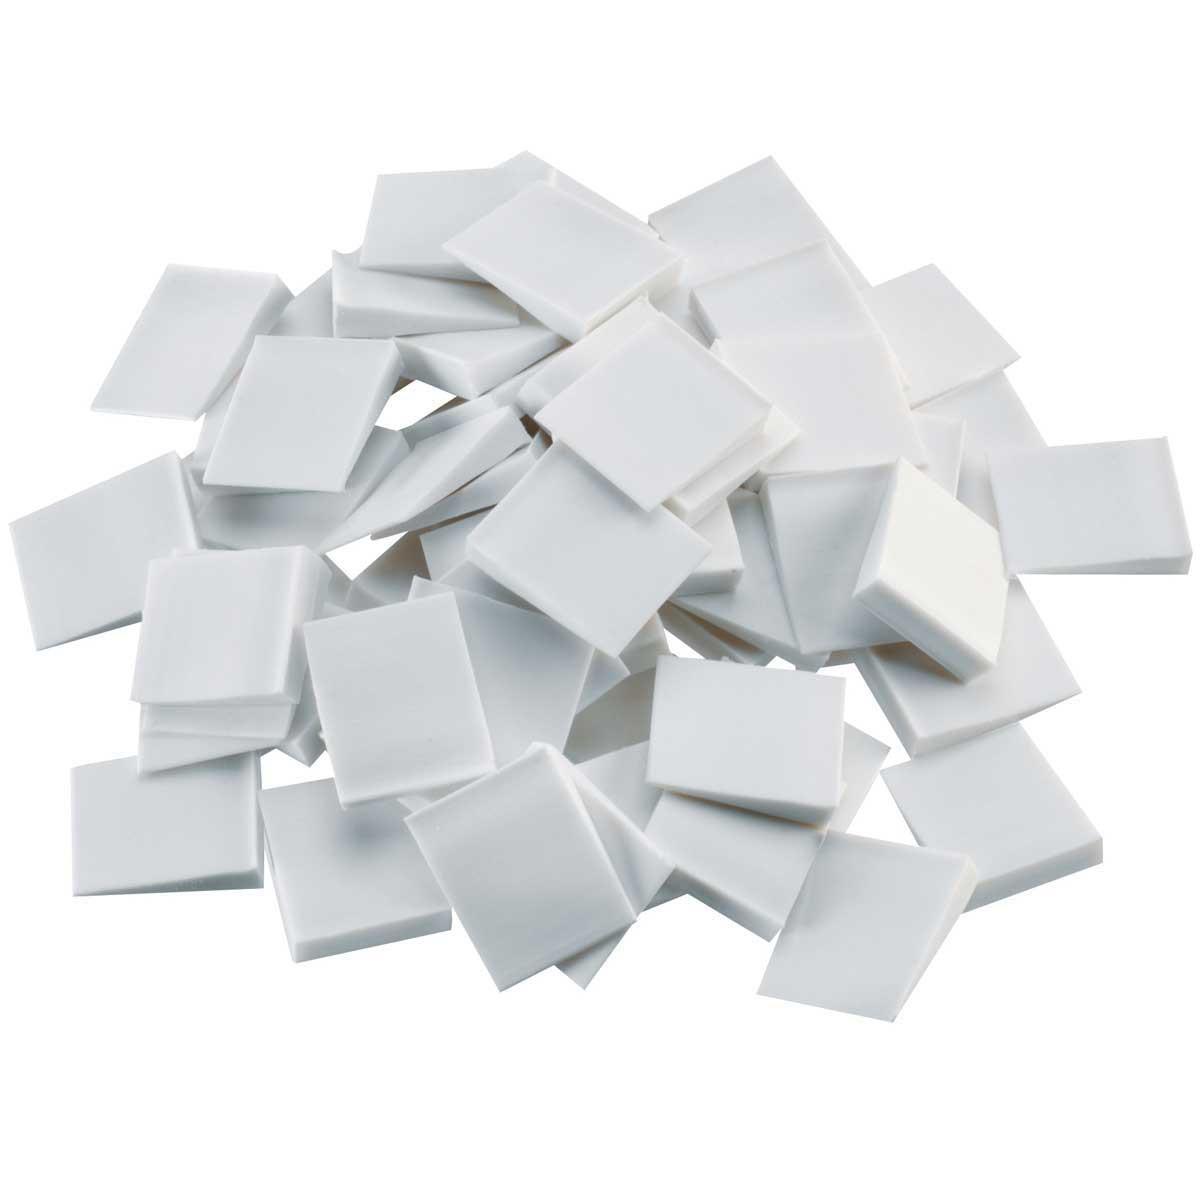 QEP Tile Wedges 500 Piece Bag